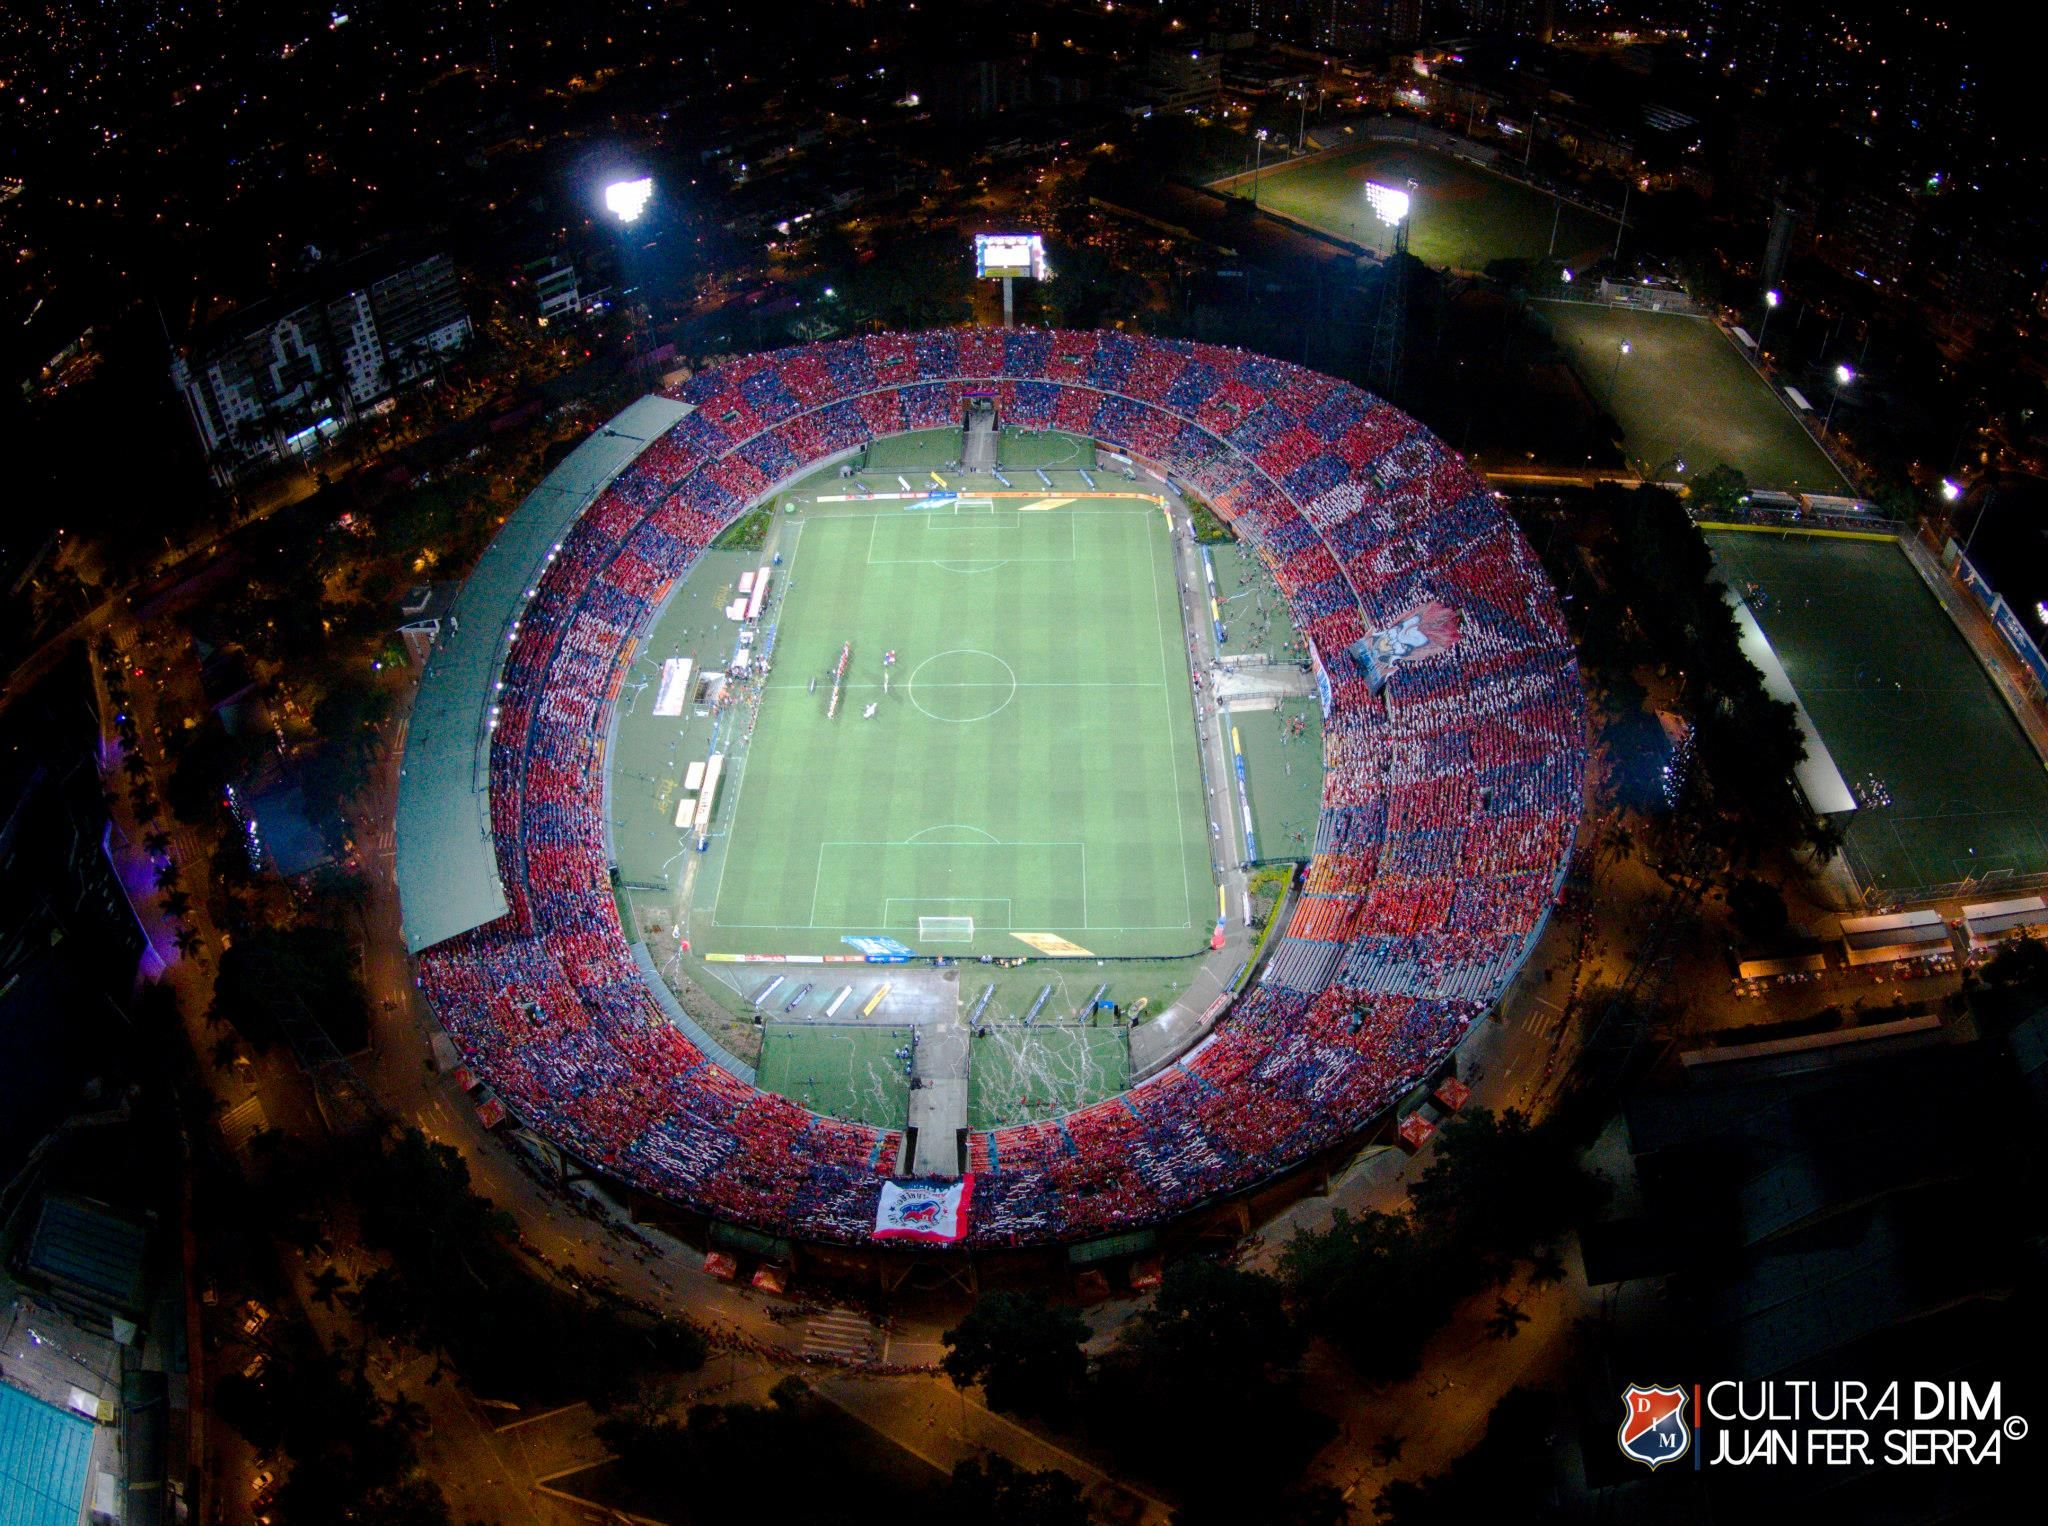 Atanasio Equipo De Futbol Imagenes De Futbol Arte Independiente